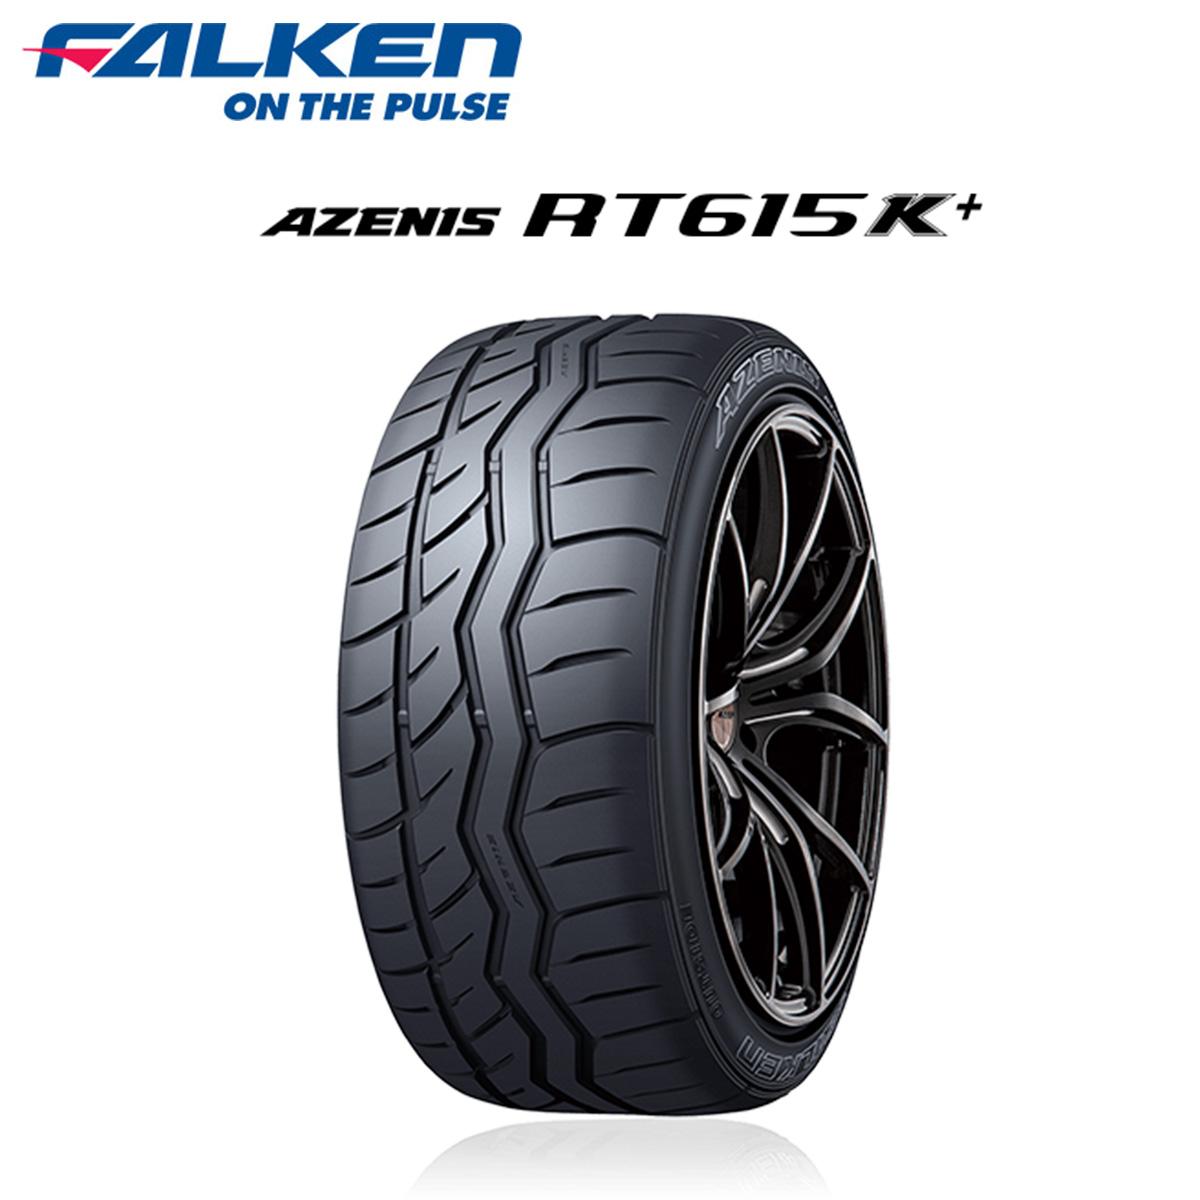 FALKEN ファルケン スポーツ タイヤ 1本 17インチ 215/40R17 AZENIS RT615K+ アゼニス